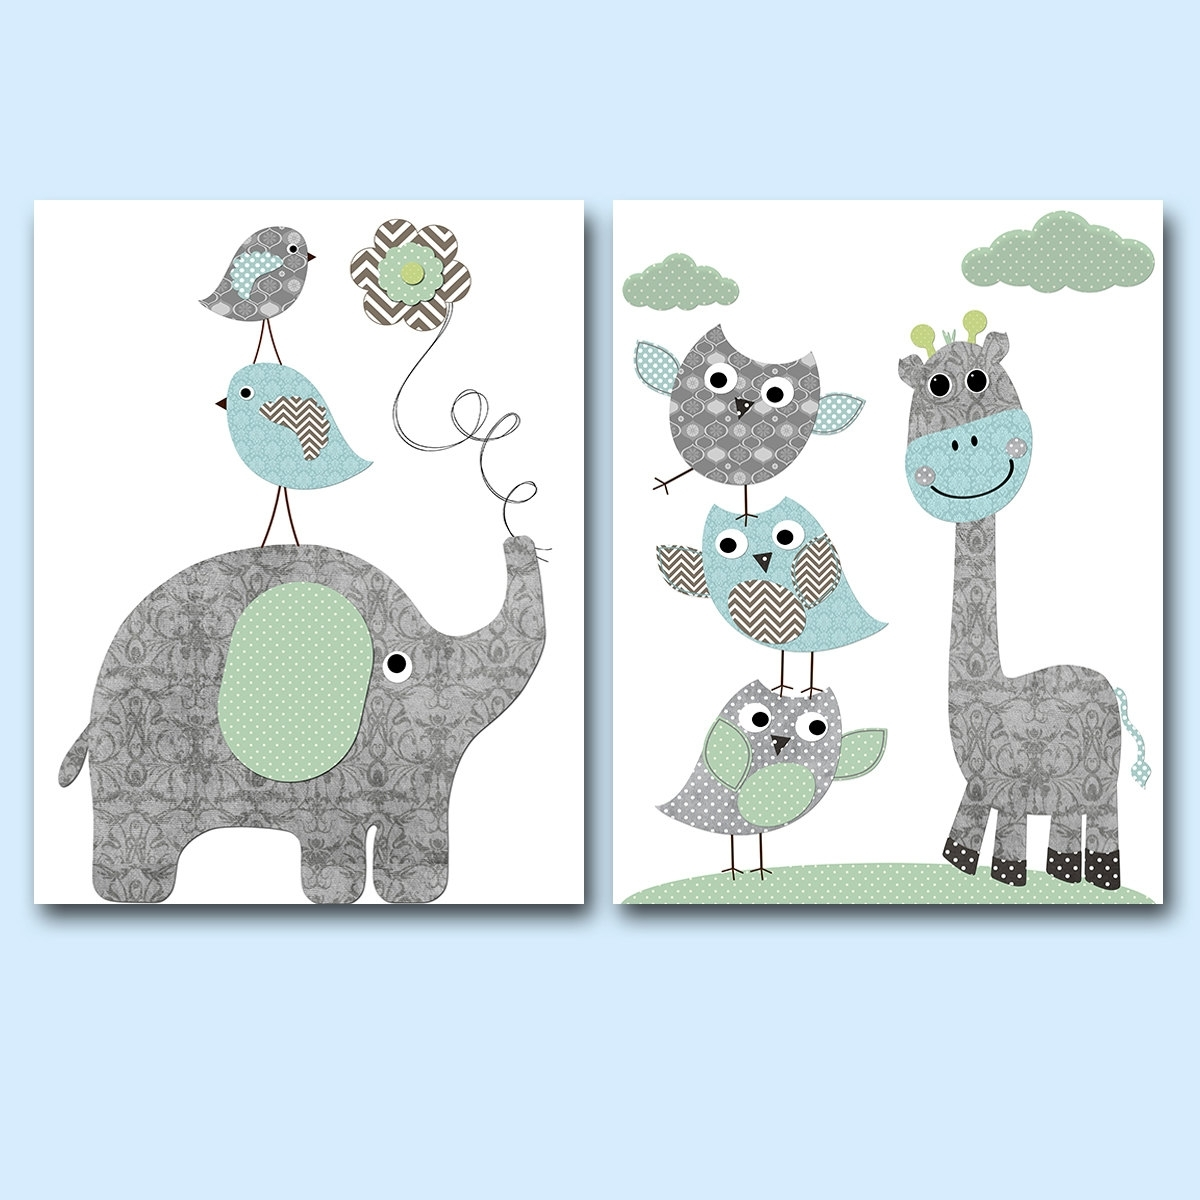 Blue Gray Canvas Art Kids Room Decor Baby Boy Nursery Art Print For 2017 Baby Room Canvas Wall Art (View 11 of 15)